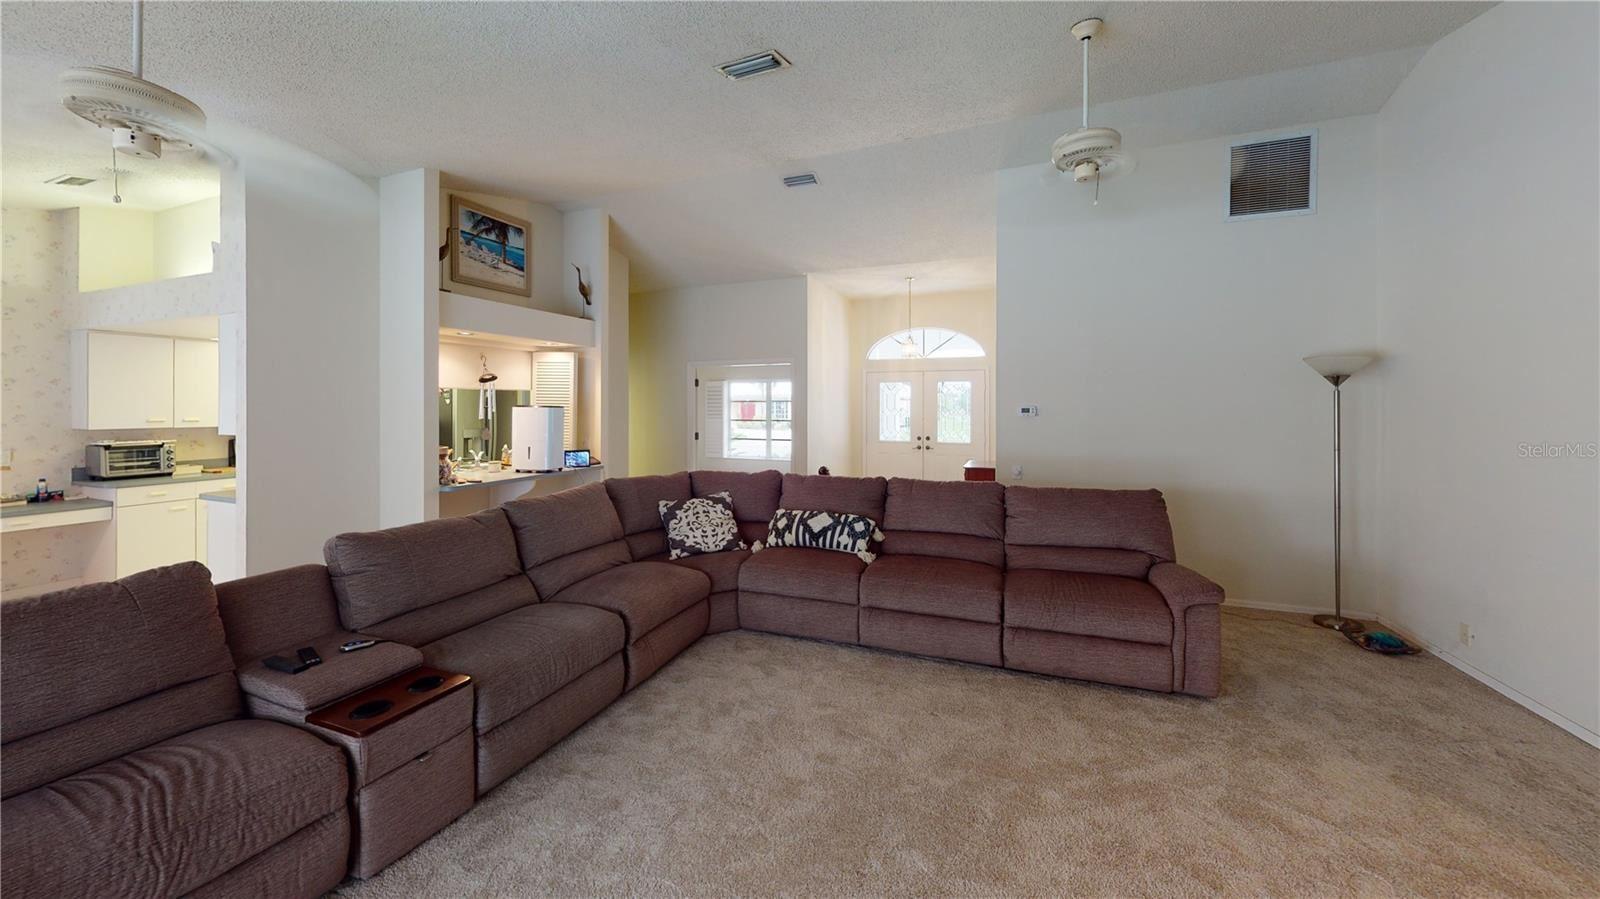 Photo of 1031 BECKLEY CIRCLE, VENICE, FL 34292 (MLS # A4510962)